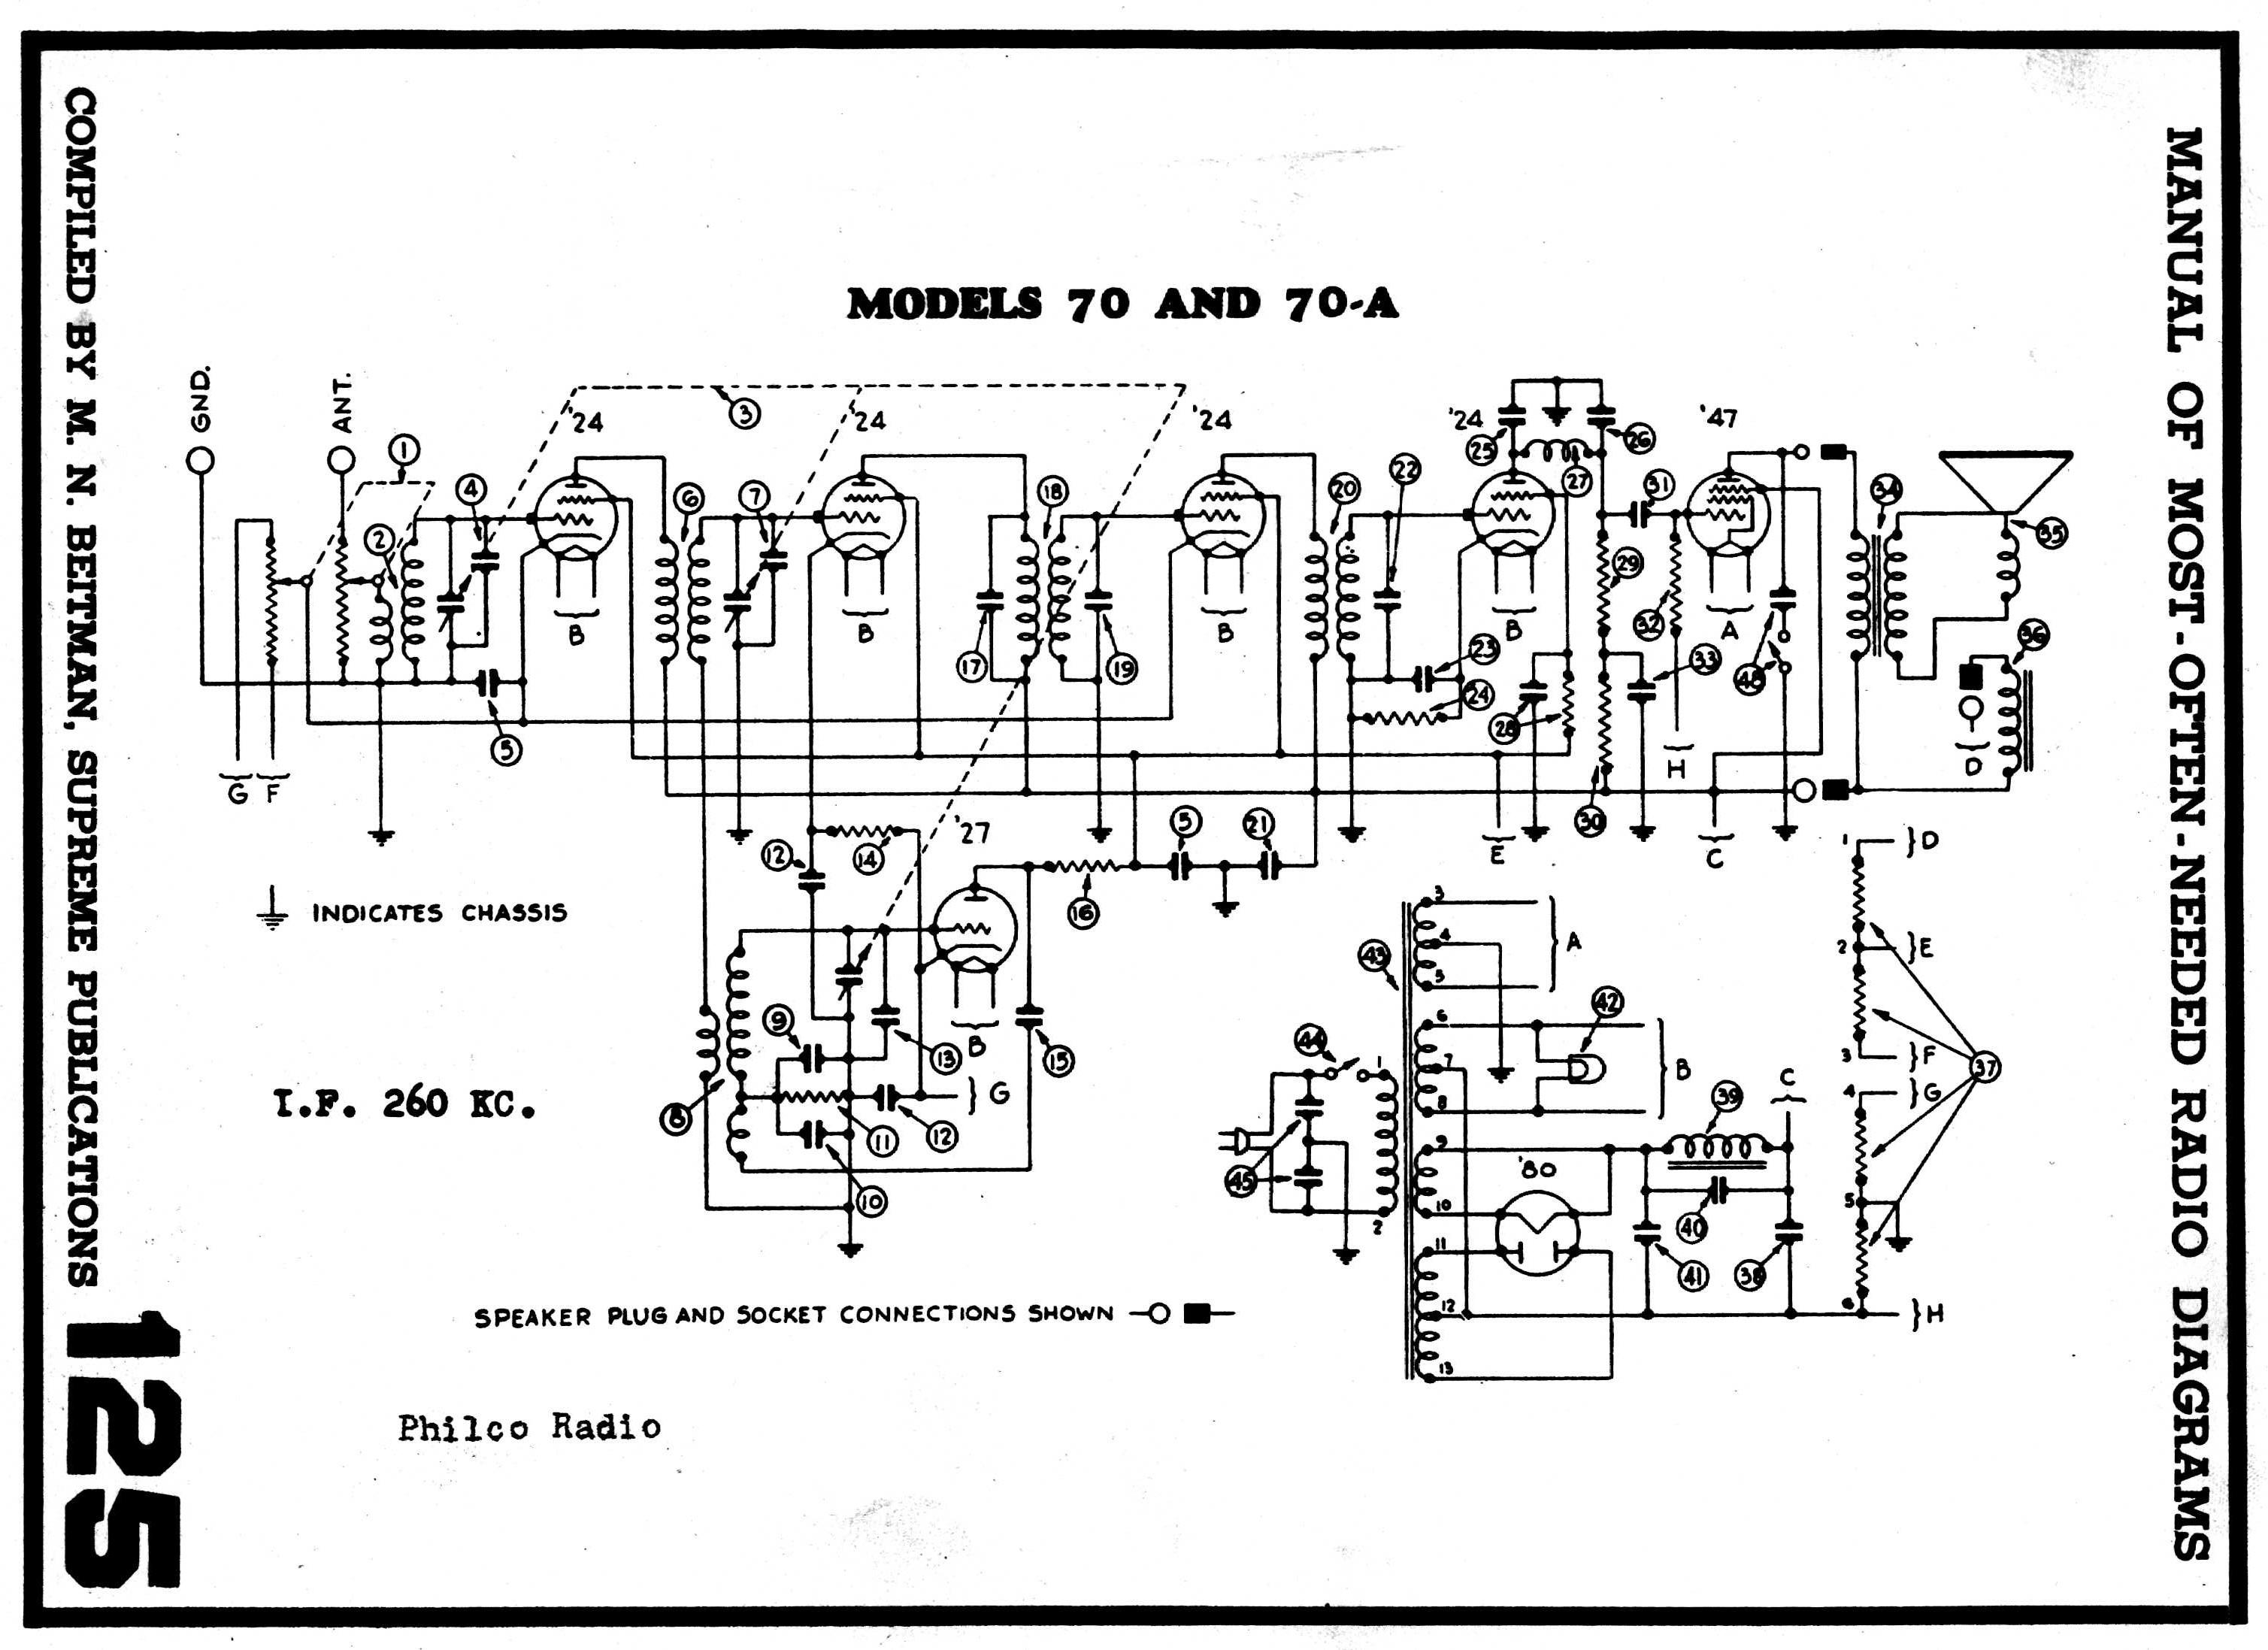 Philco Transformer Wire Color Diagram - Circuit Connection Diagram •